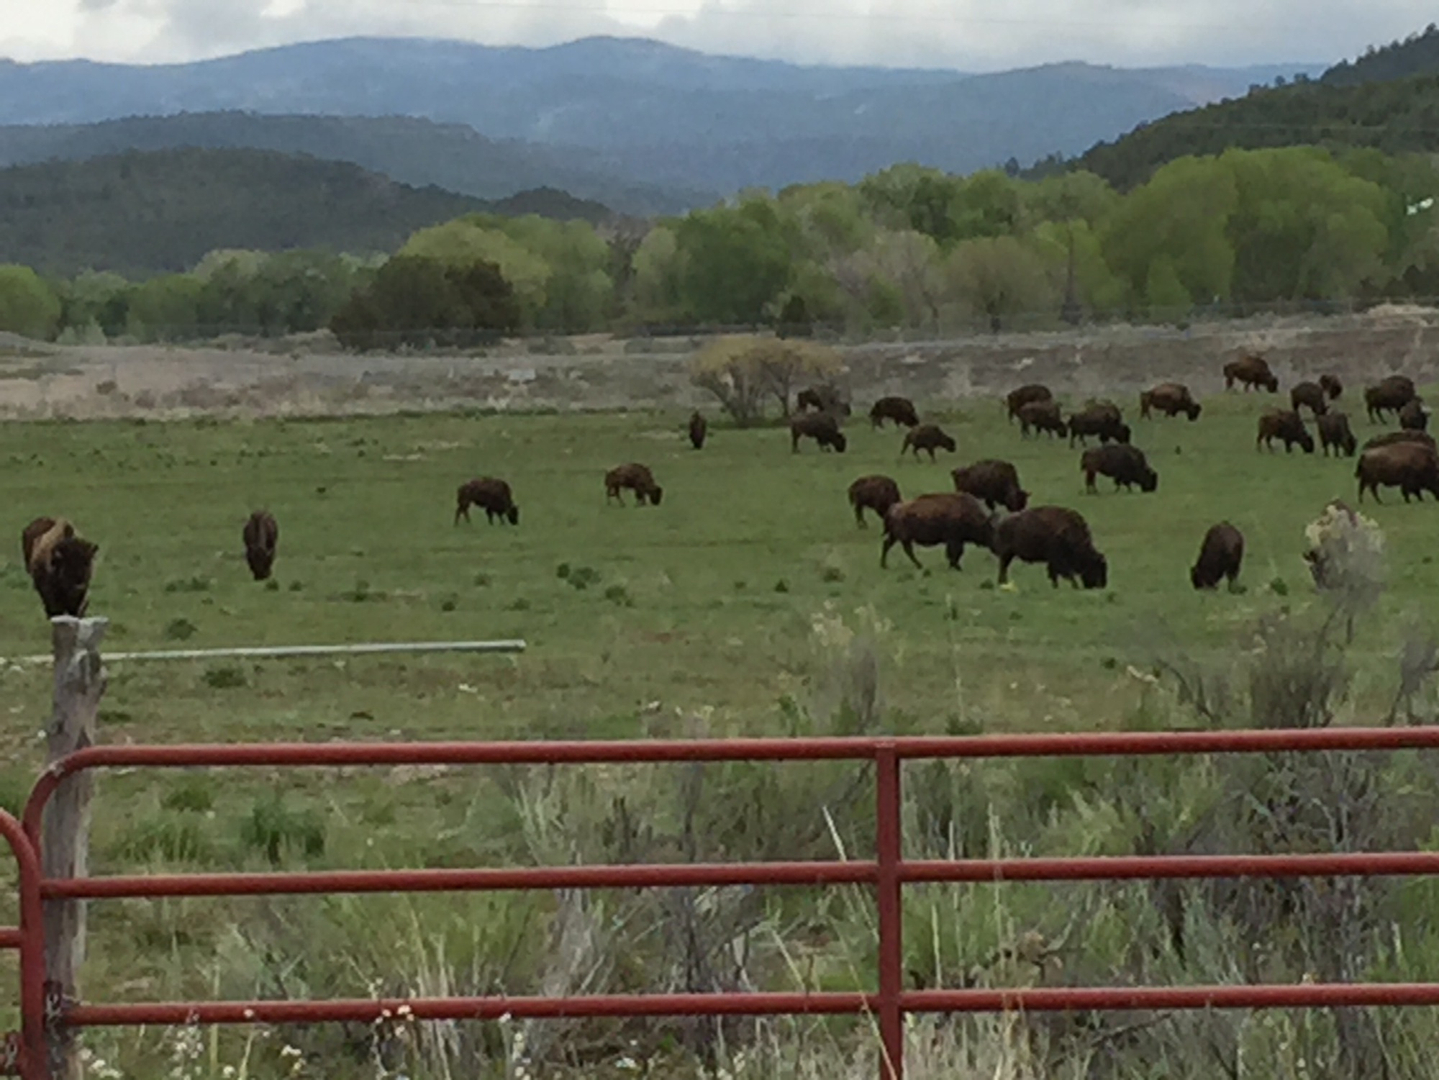 New mexico taos county penasco - Po Box 127 Pueblo View State Road 75 Penasco New Mexico 87553 Tribalsecretary Picurispueblo Org